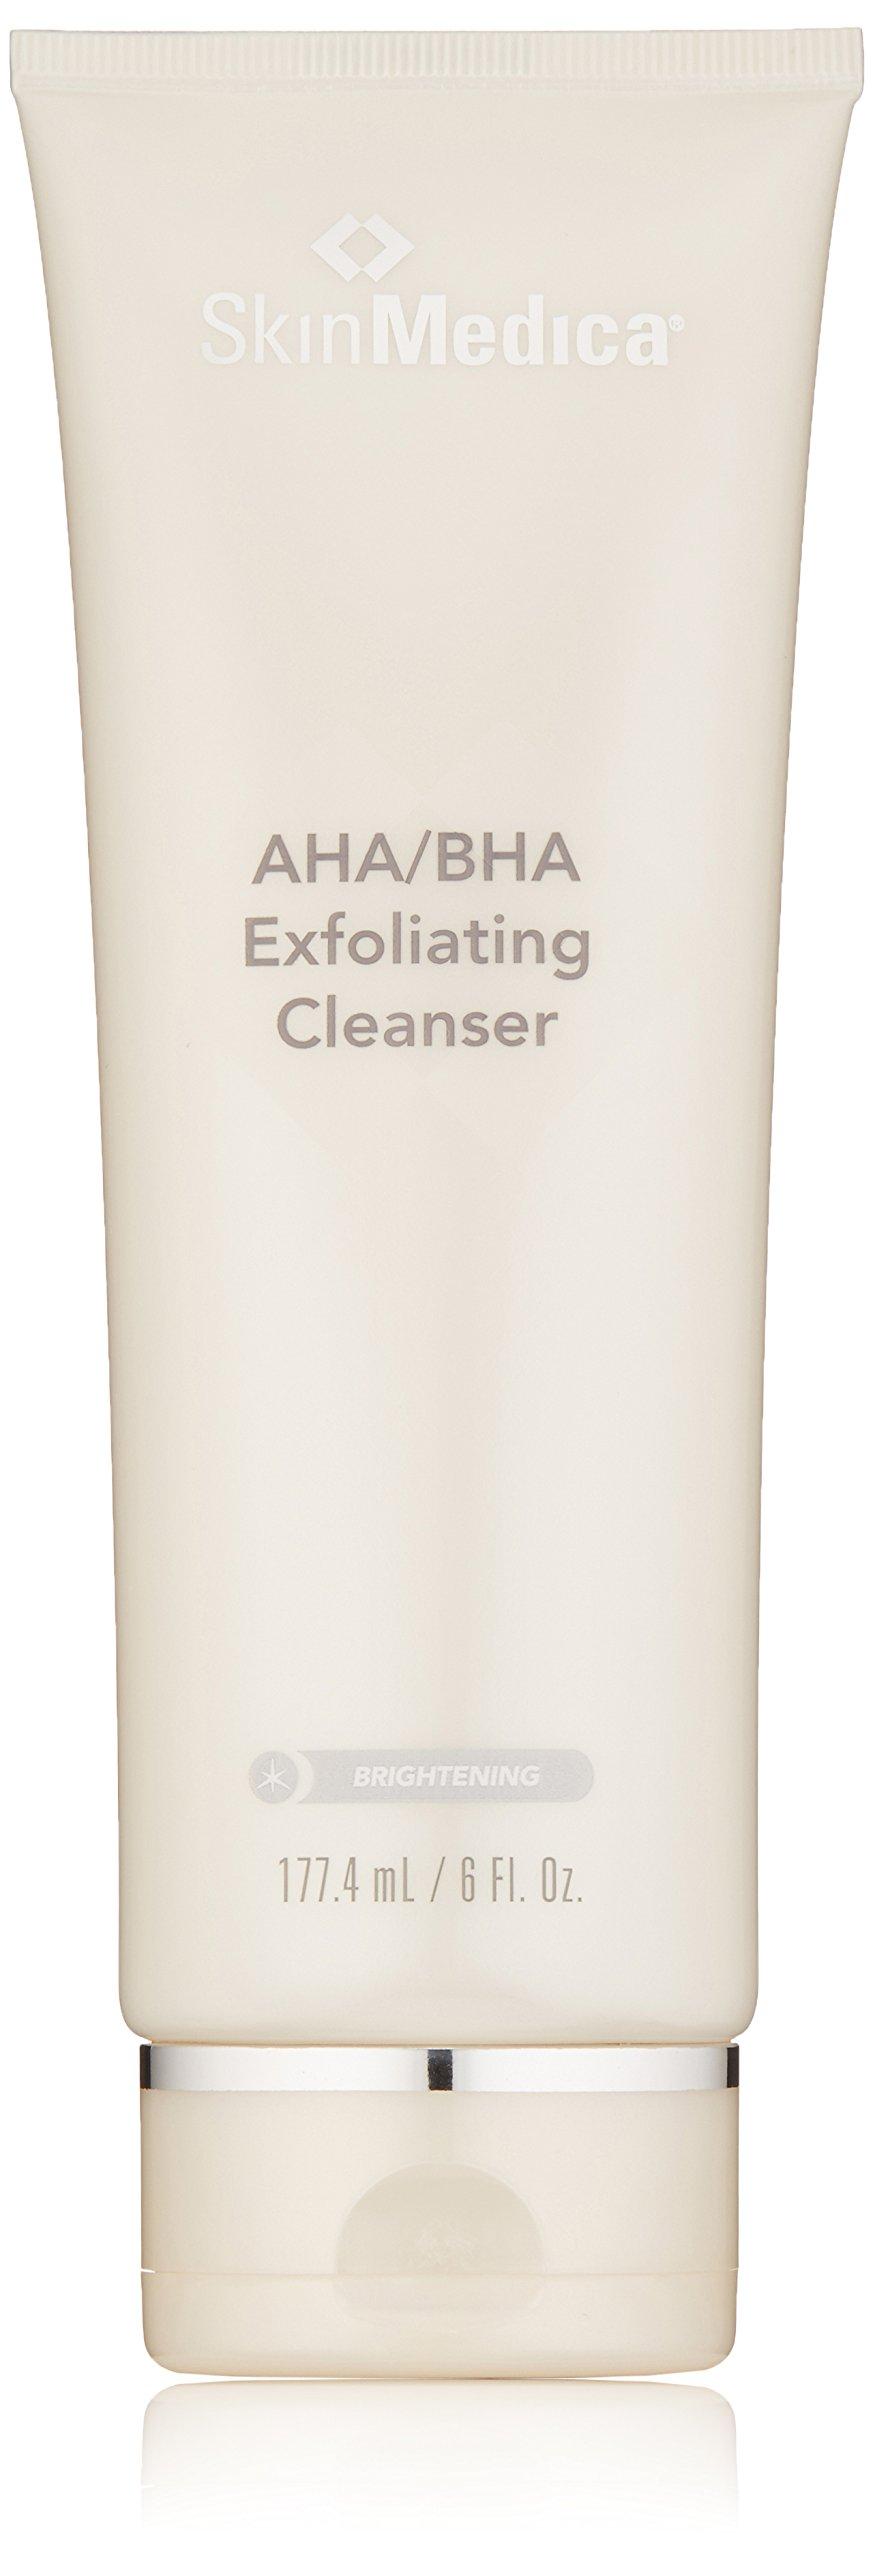 Skinmedica AHA/BHA Exfoliating Cleanser, 6.0 Fluid Ounce